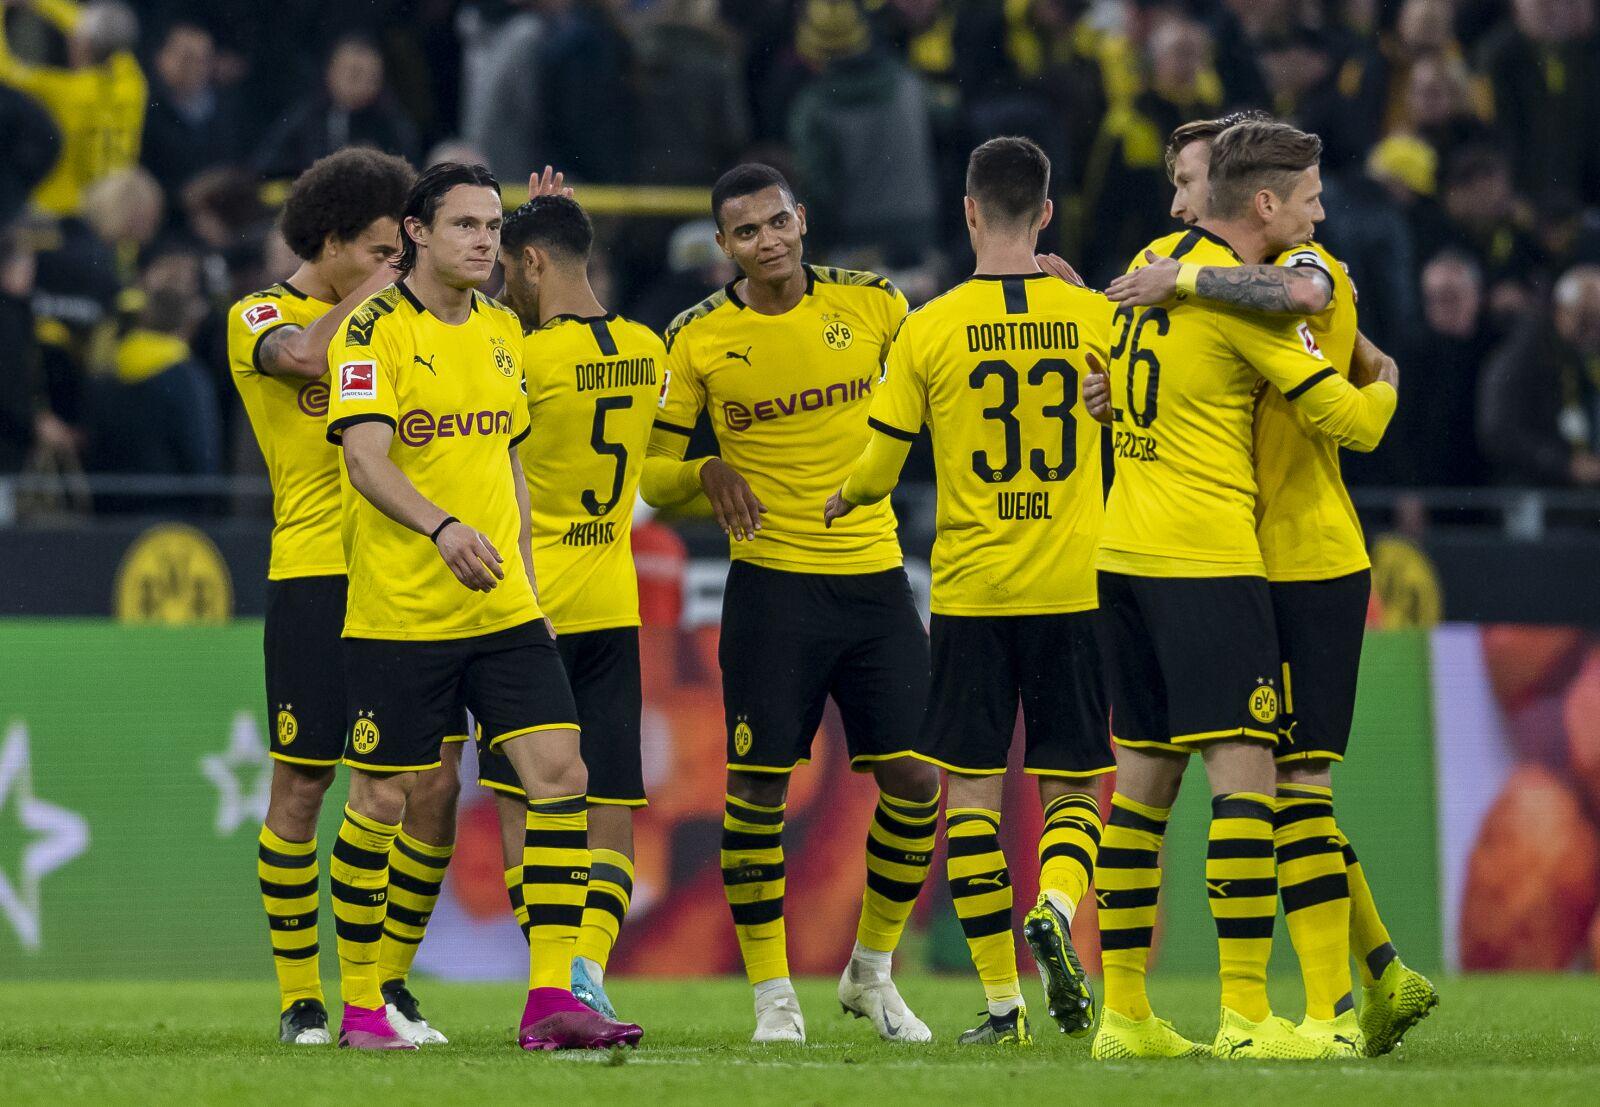 Bundesliga Roundup: Borussia Dortmund return to winning ways, Bayern concede last gasp equaliser